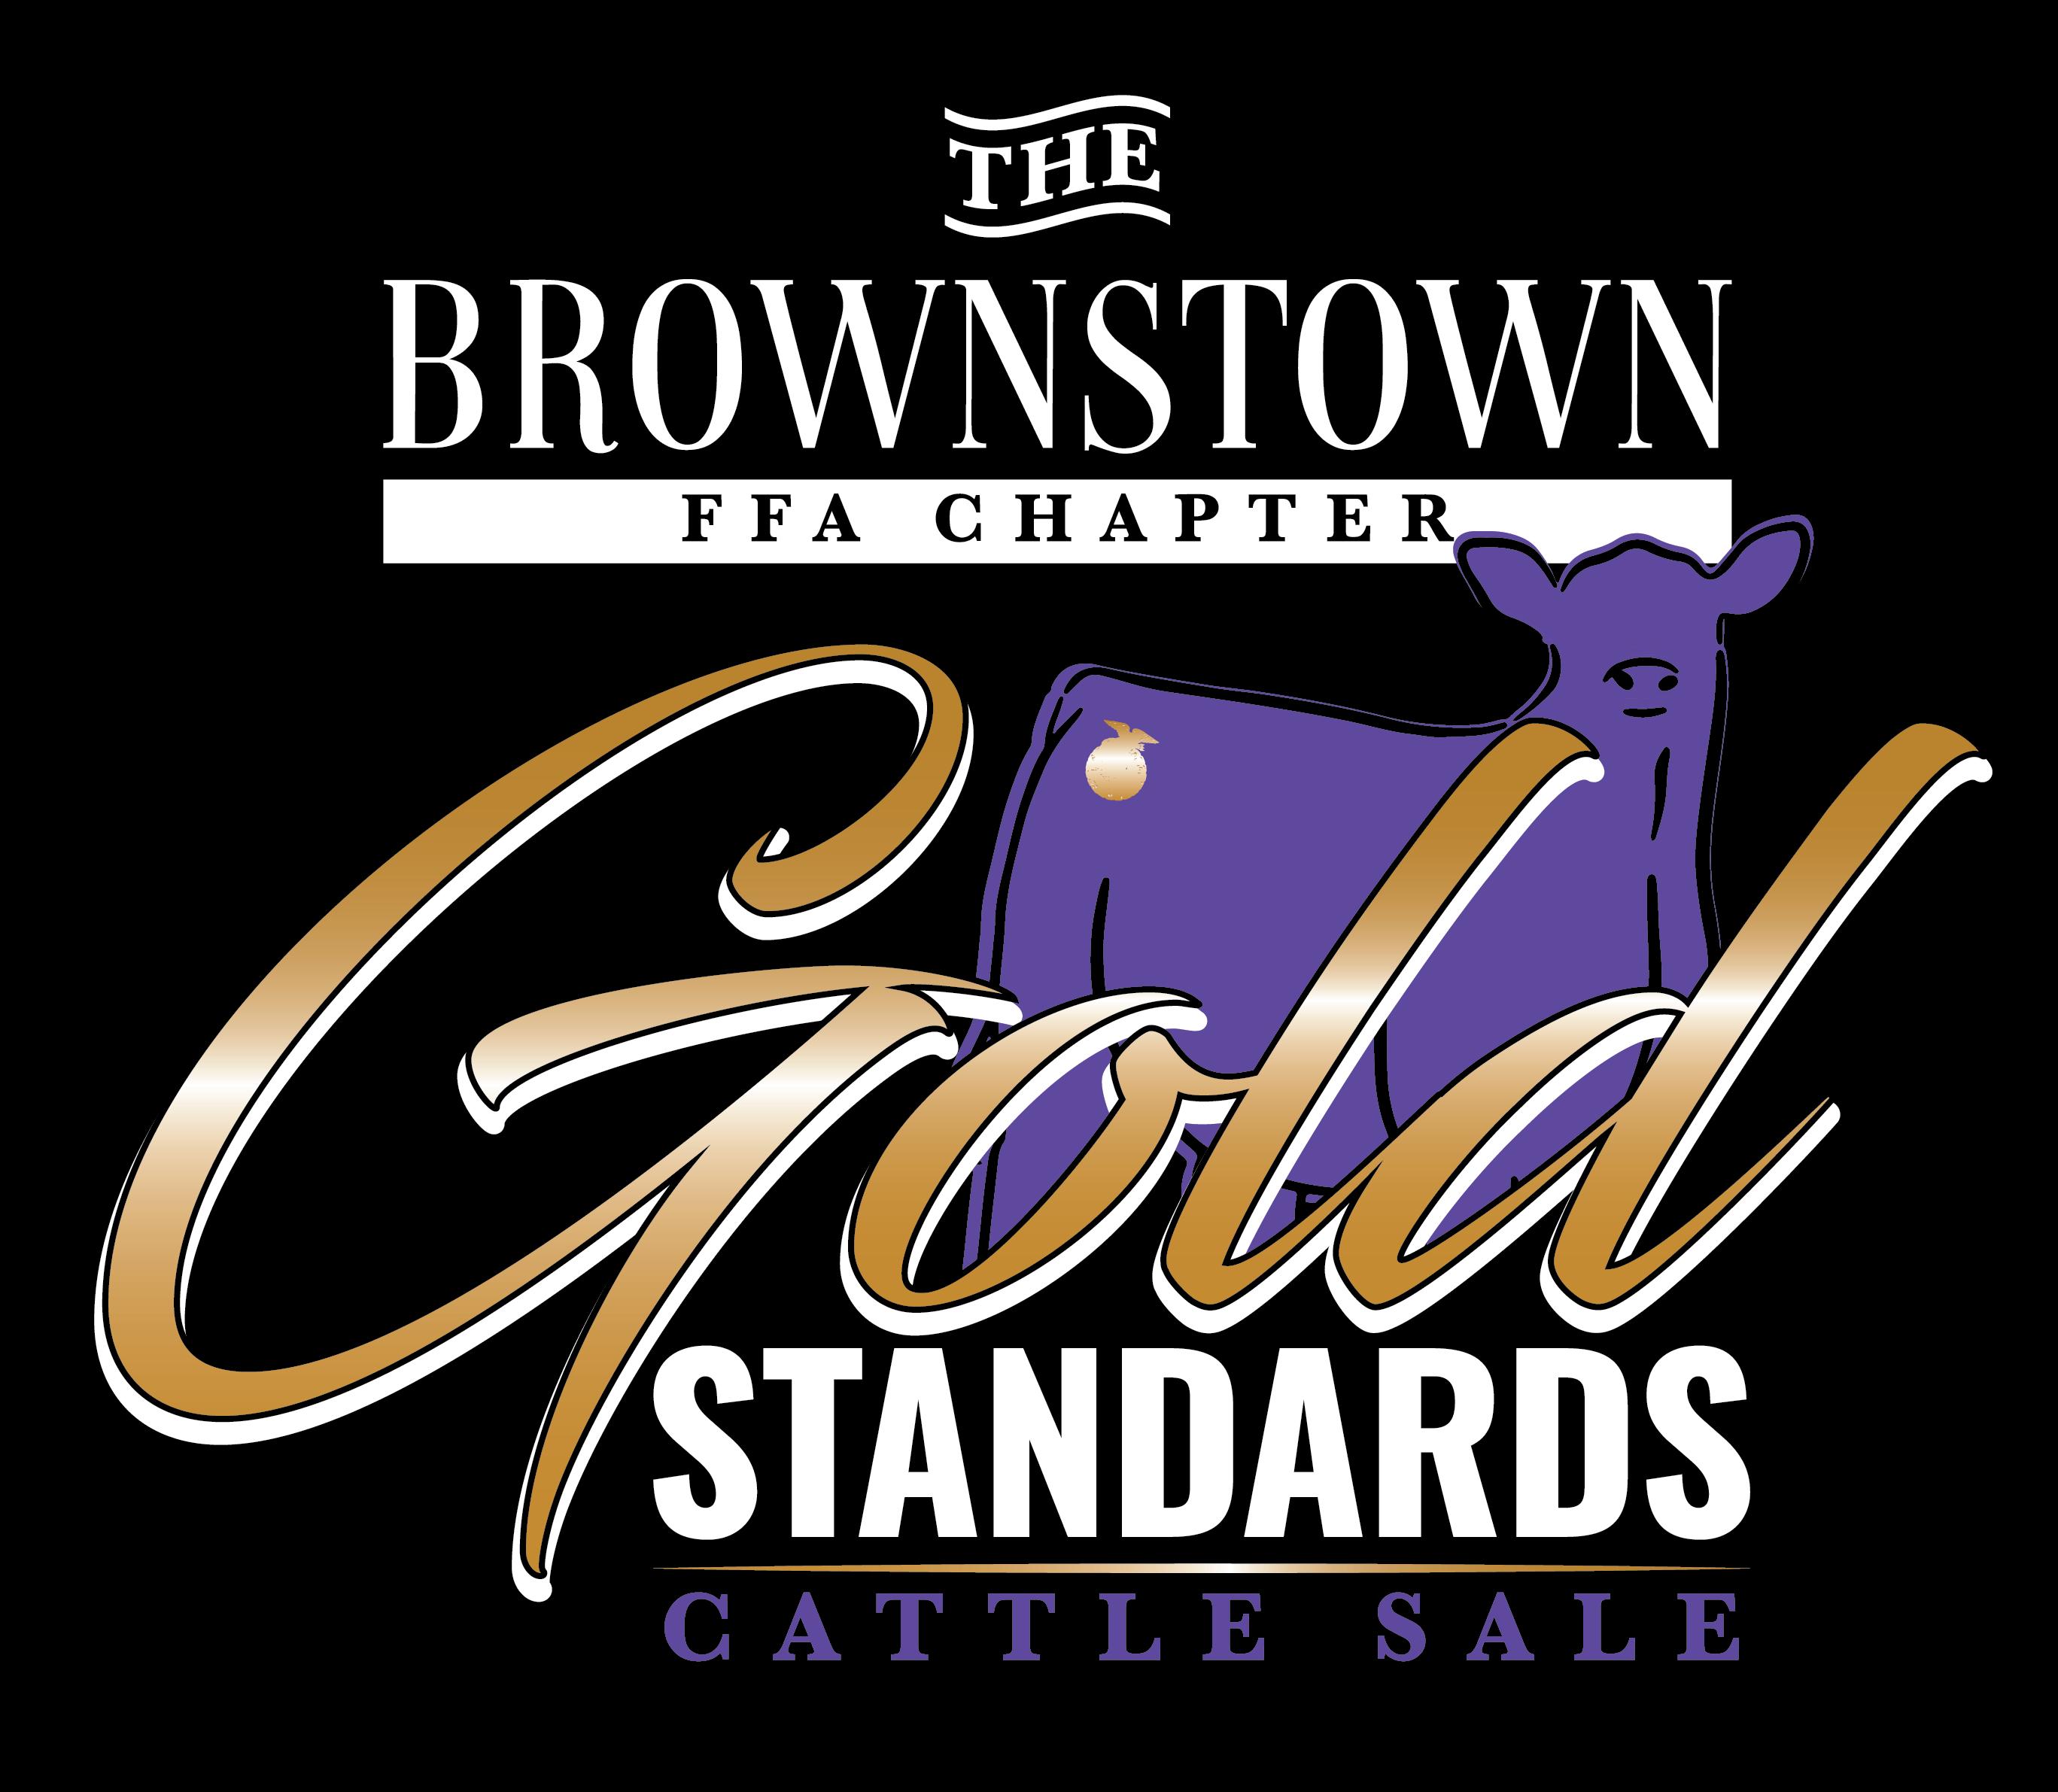 Cattle Sale